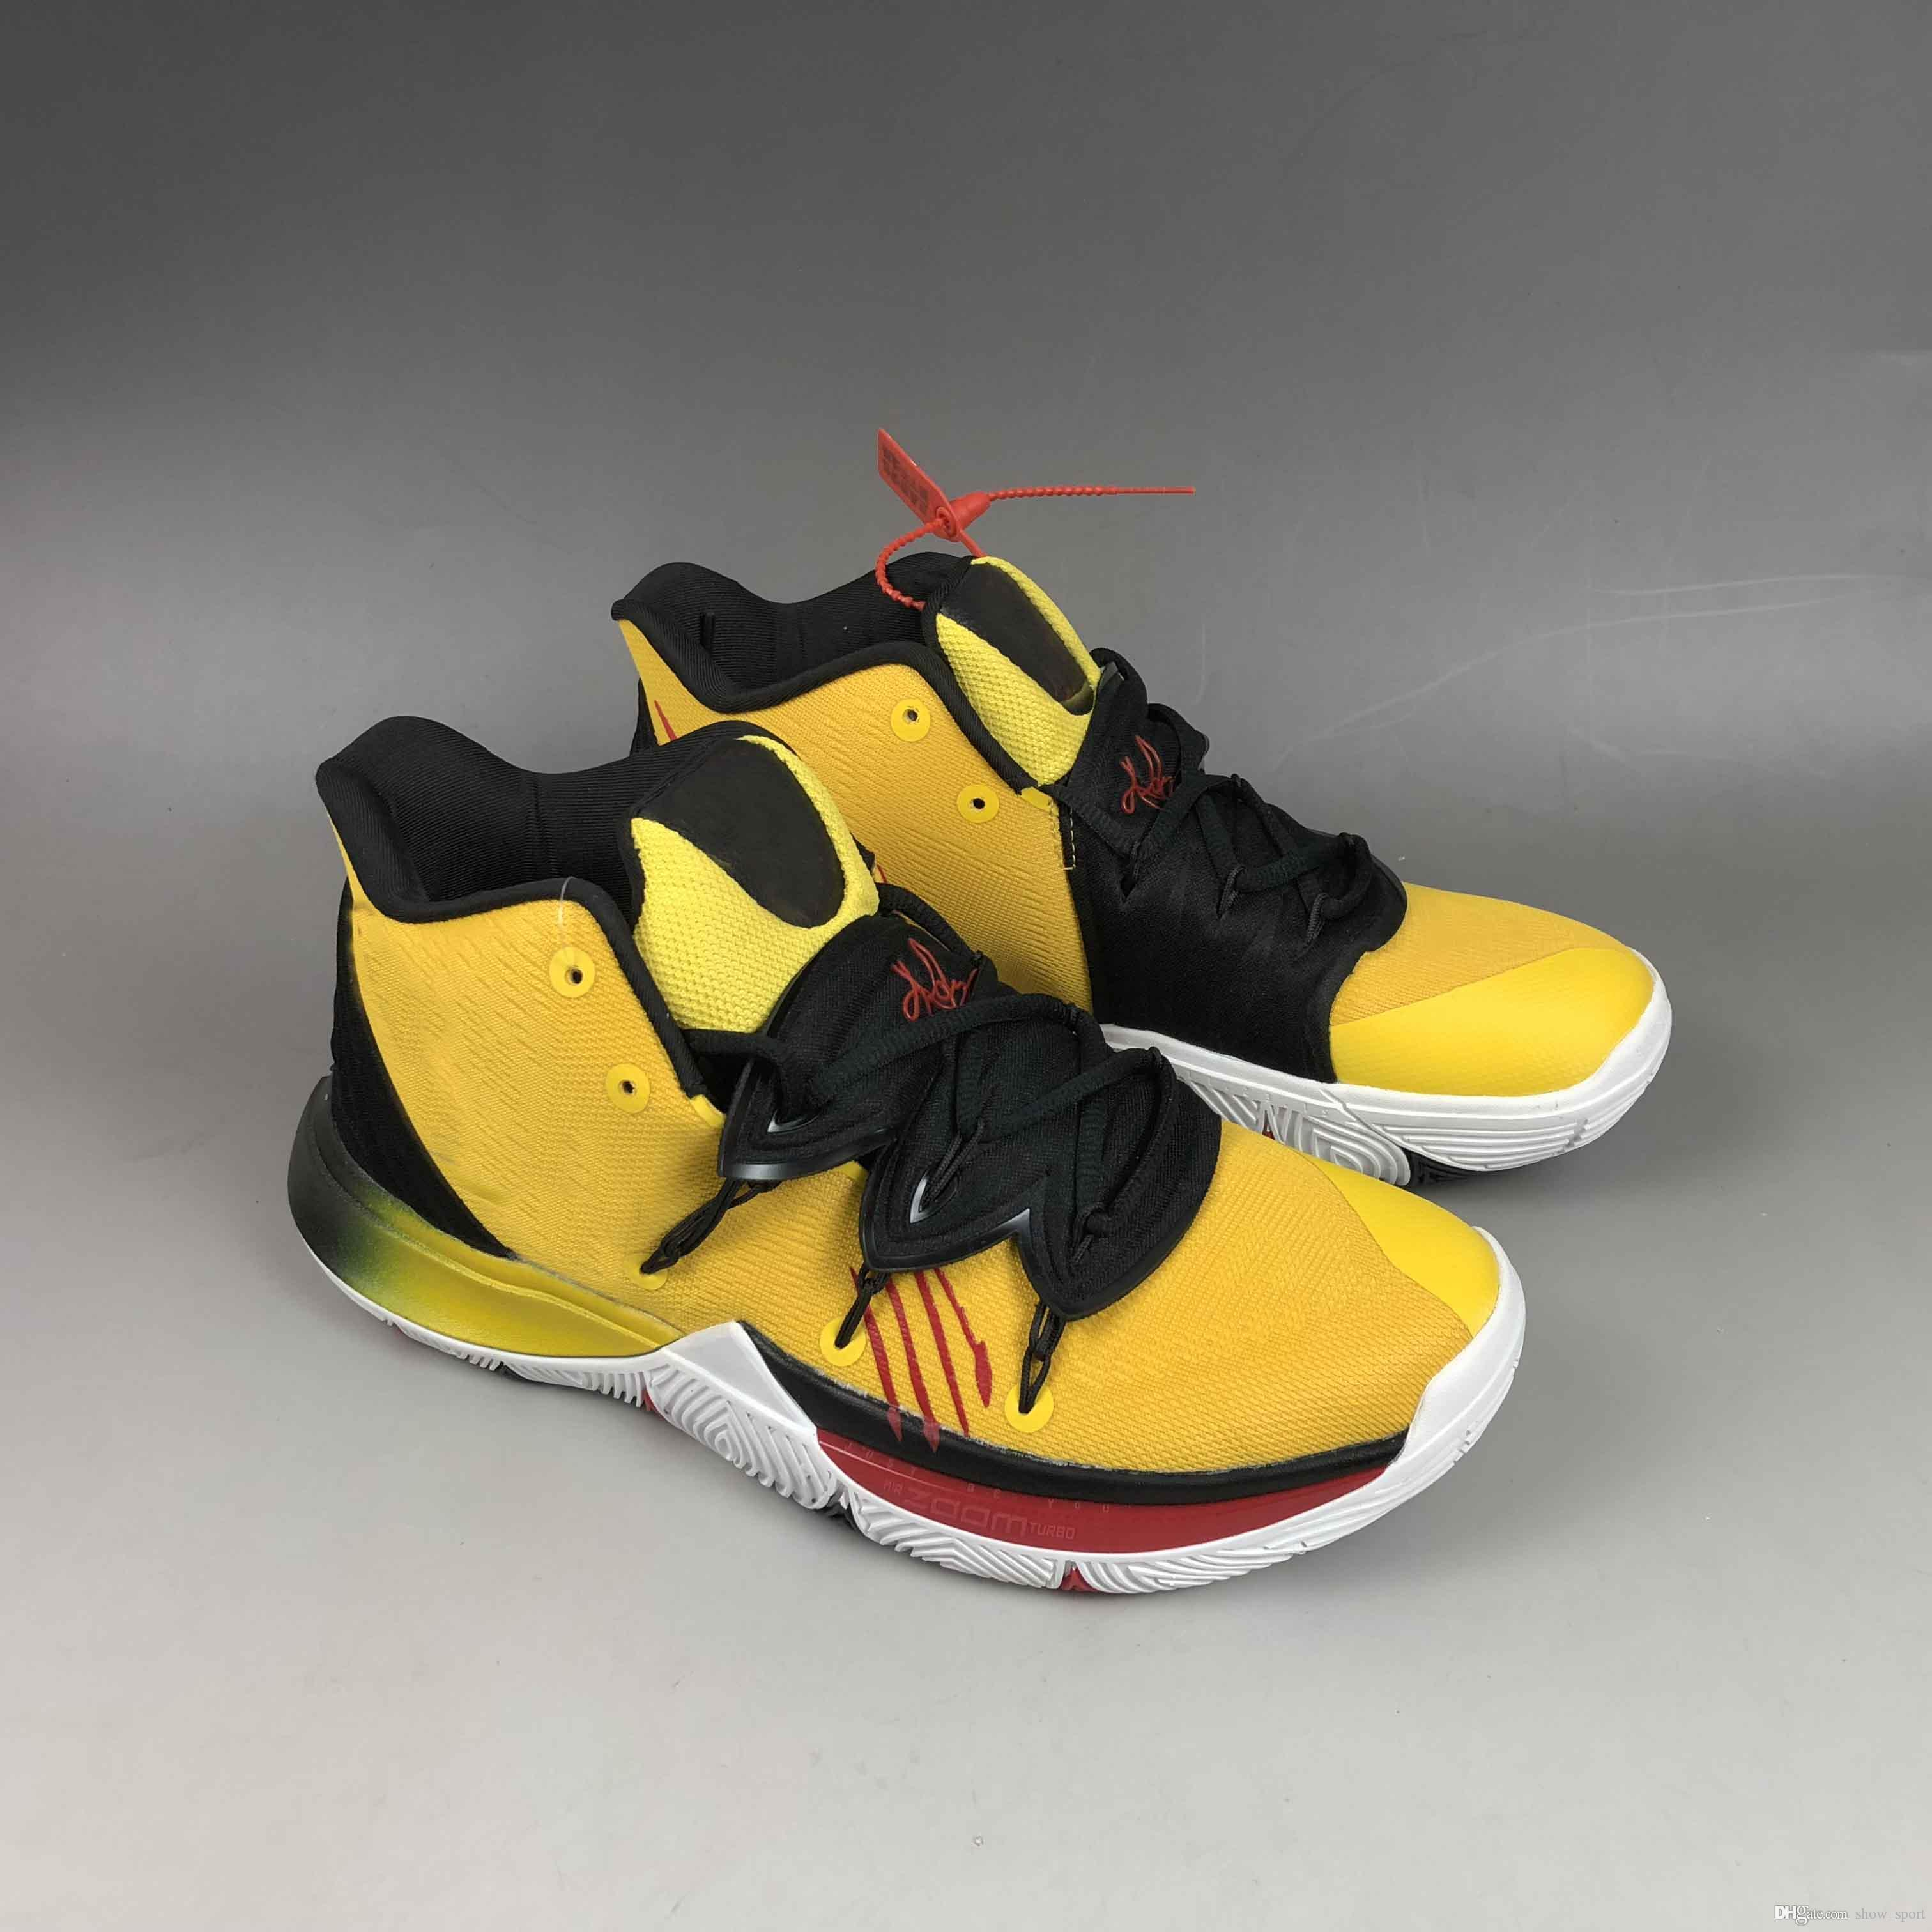 official photos 1aefa b46c2 Großhandel 2019 New Limited Kyrie Black Magic 5 V Herren Basketball Schuhe  Uncle Drew 5S Zoom Sporttraining Sneakers Hohe Knöchelgröße 40 46 Von  Show sport, ...